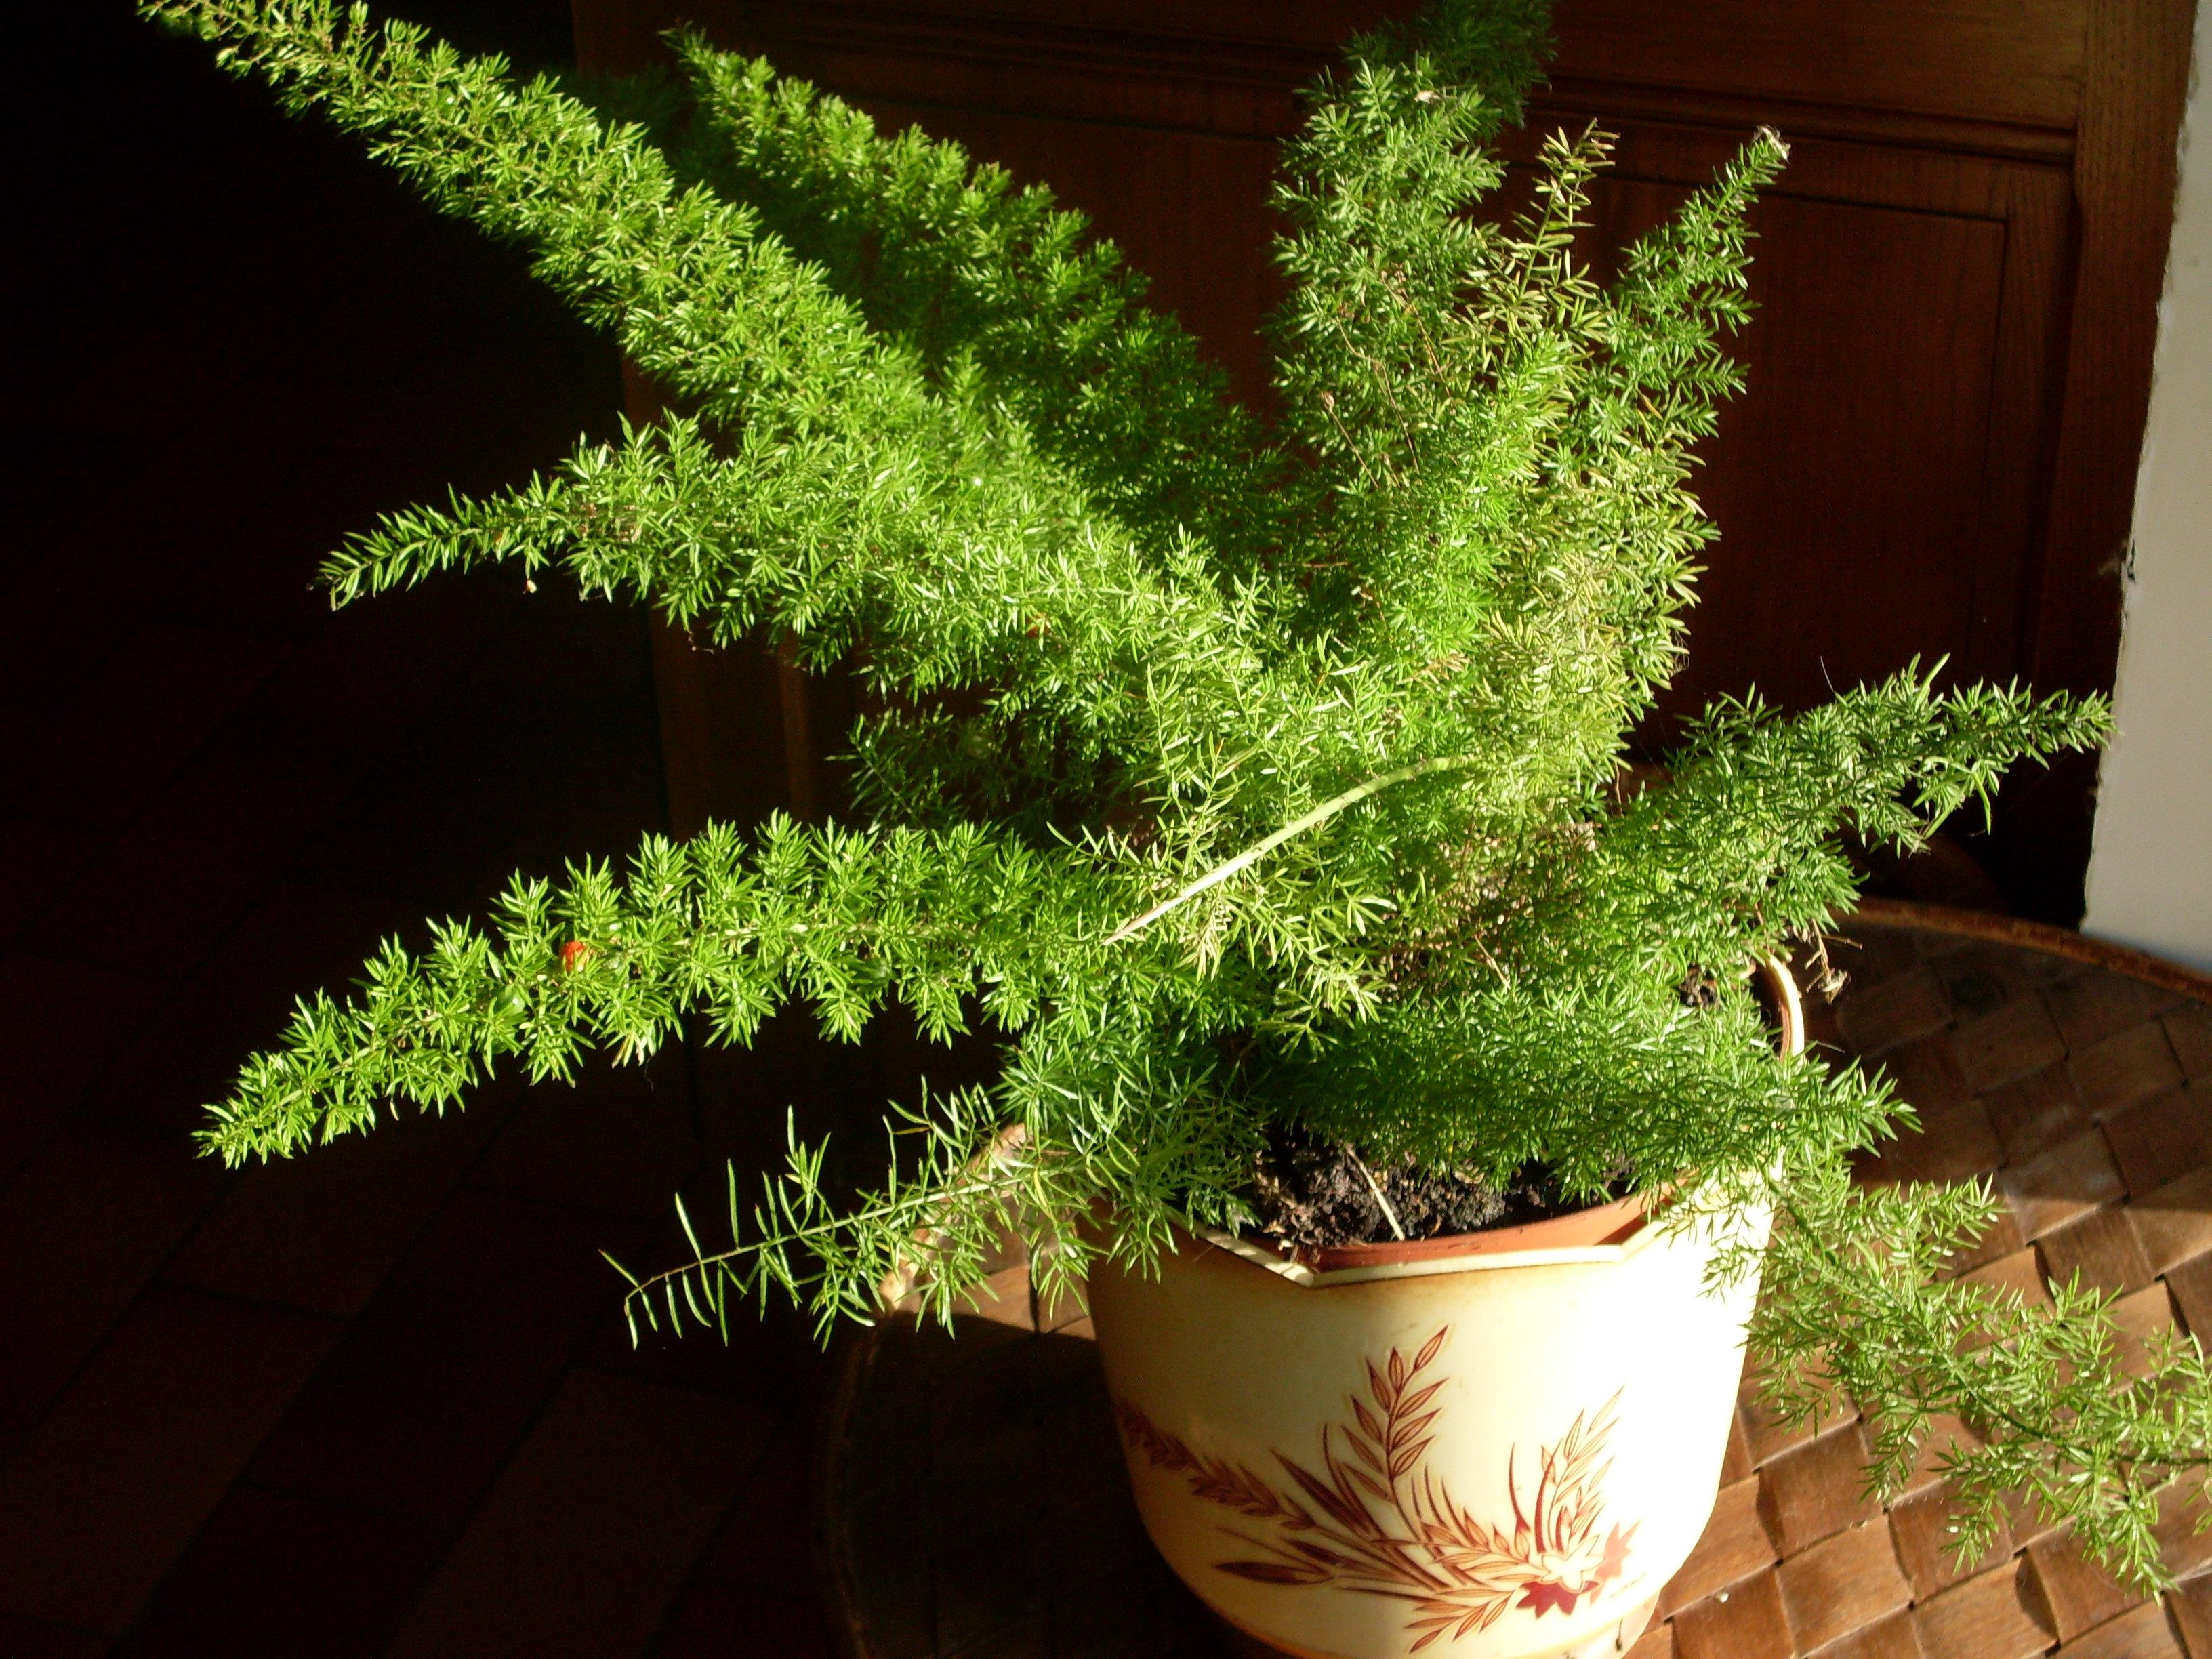 File:Asparagus densiflorus 'Myersii'.jpg - Wikimedia Commons